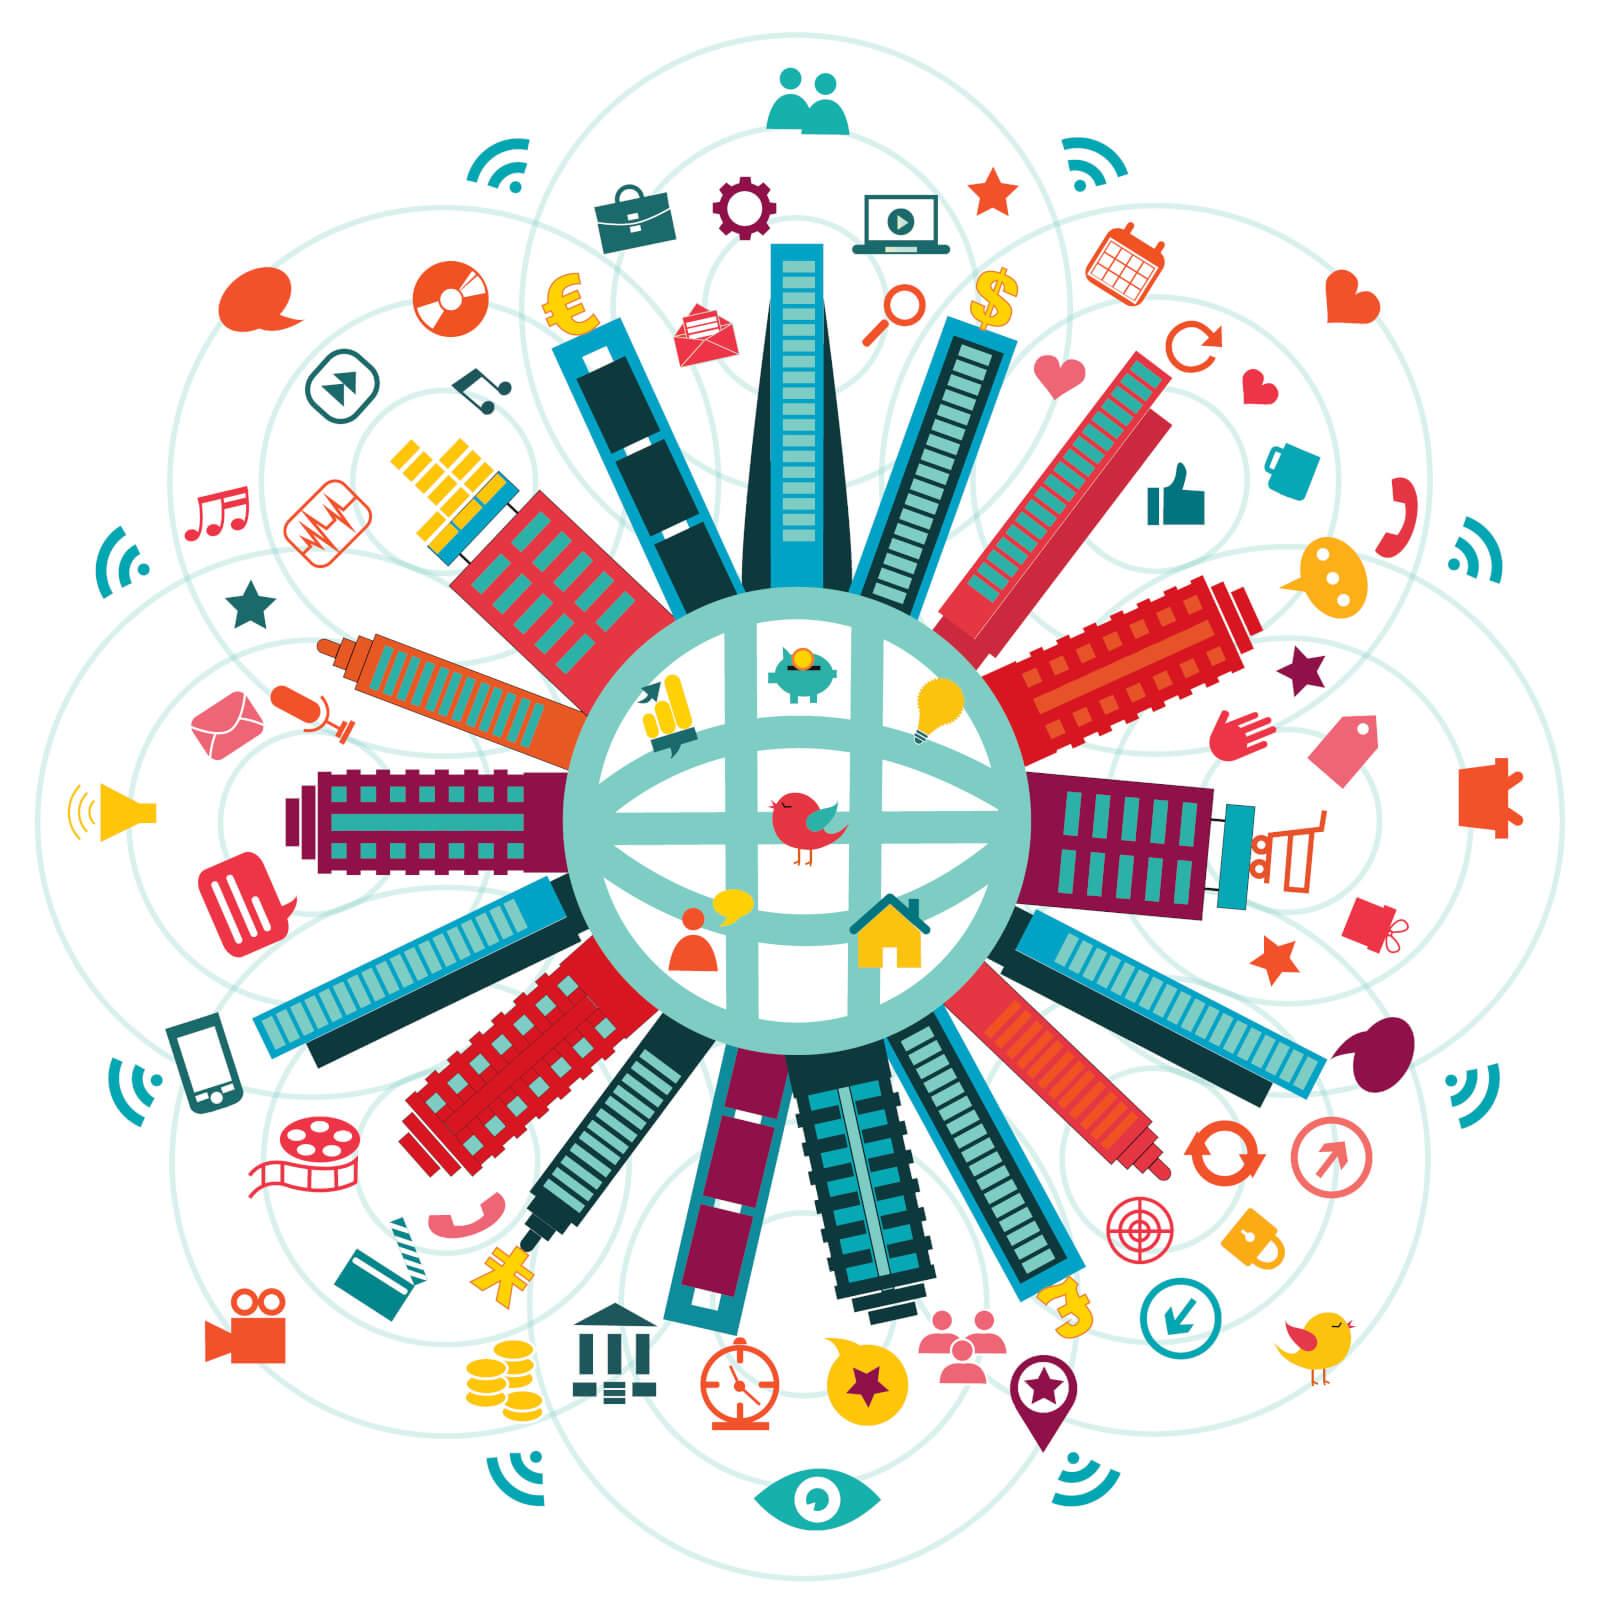 Internet of Things app development, IoT app development, developer